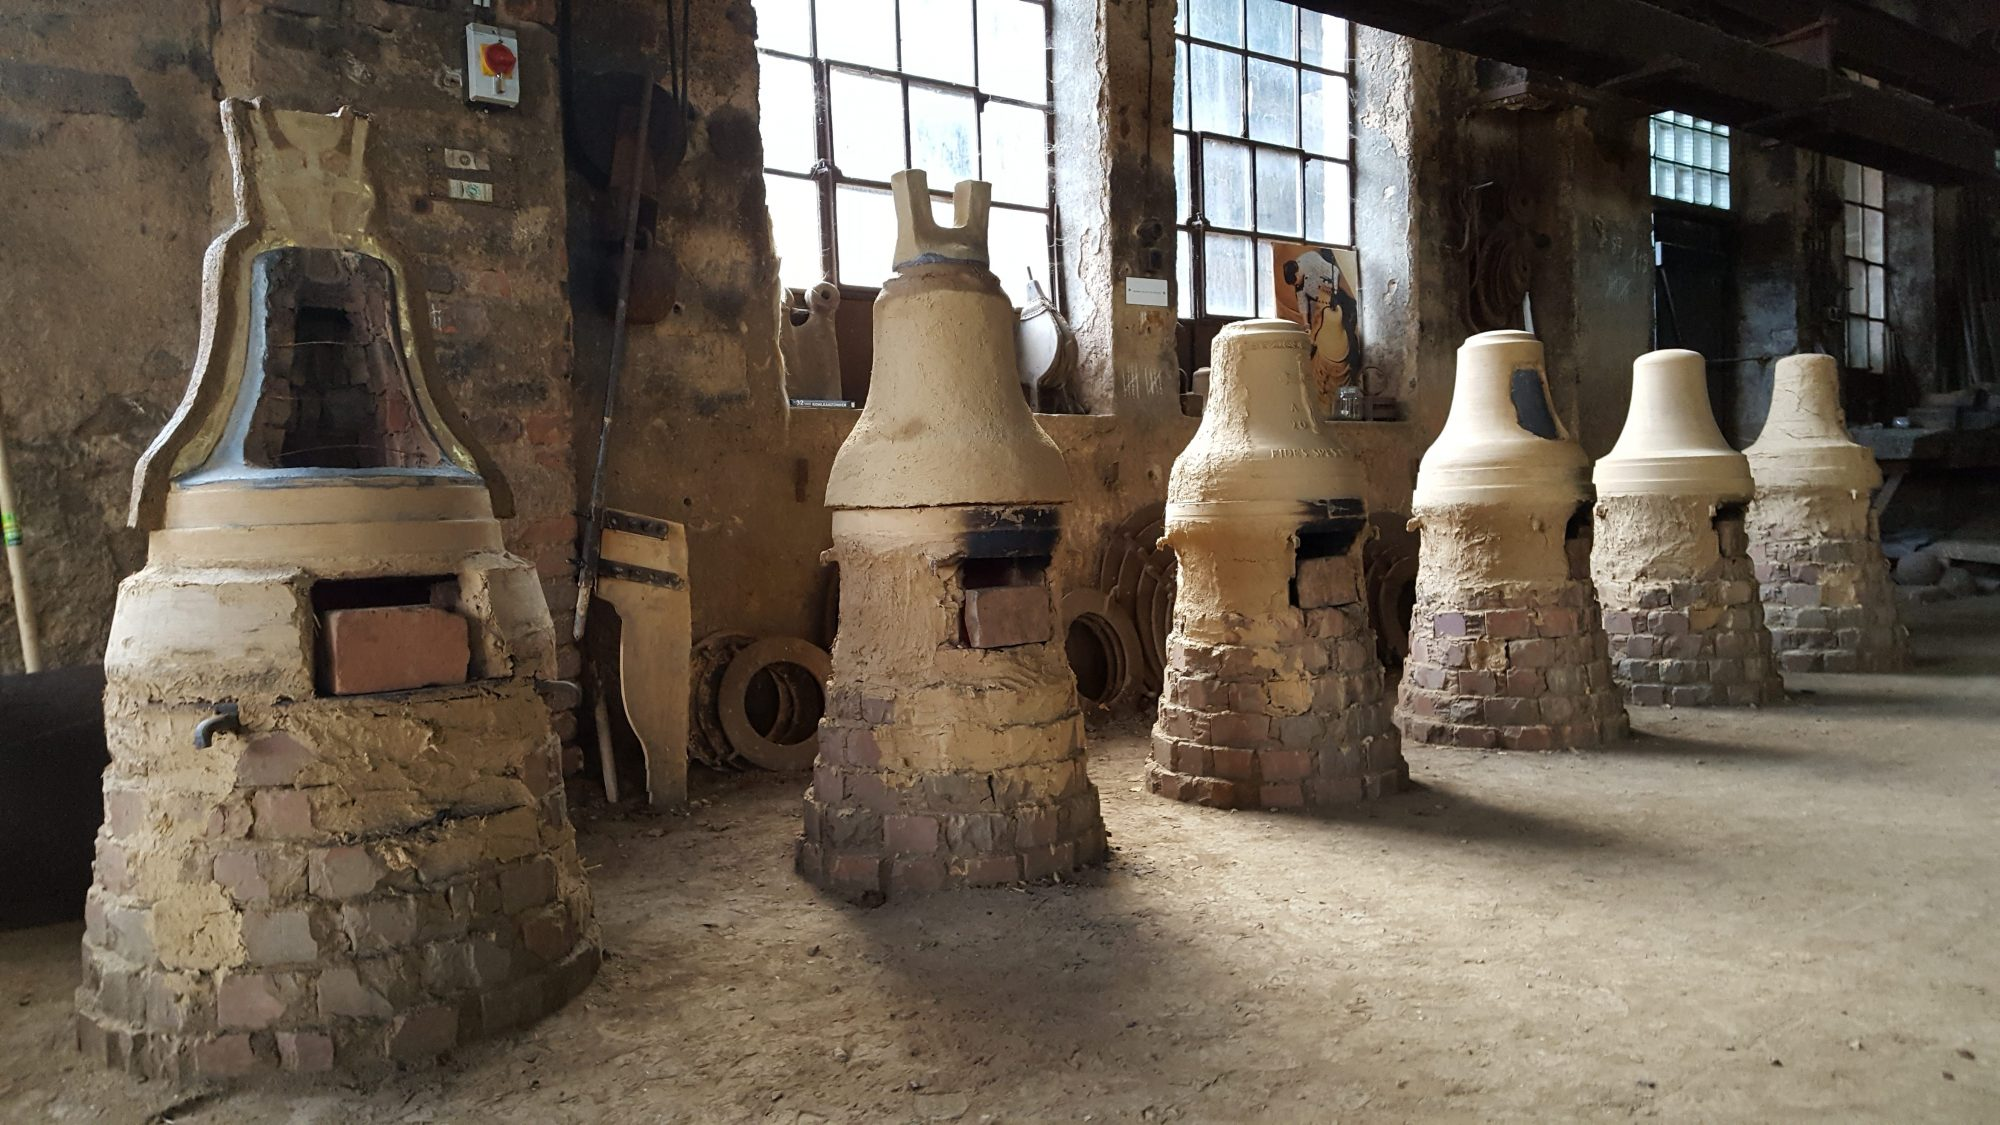 Kulturgießerei Museum Glockengießerei Mabilon